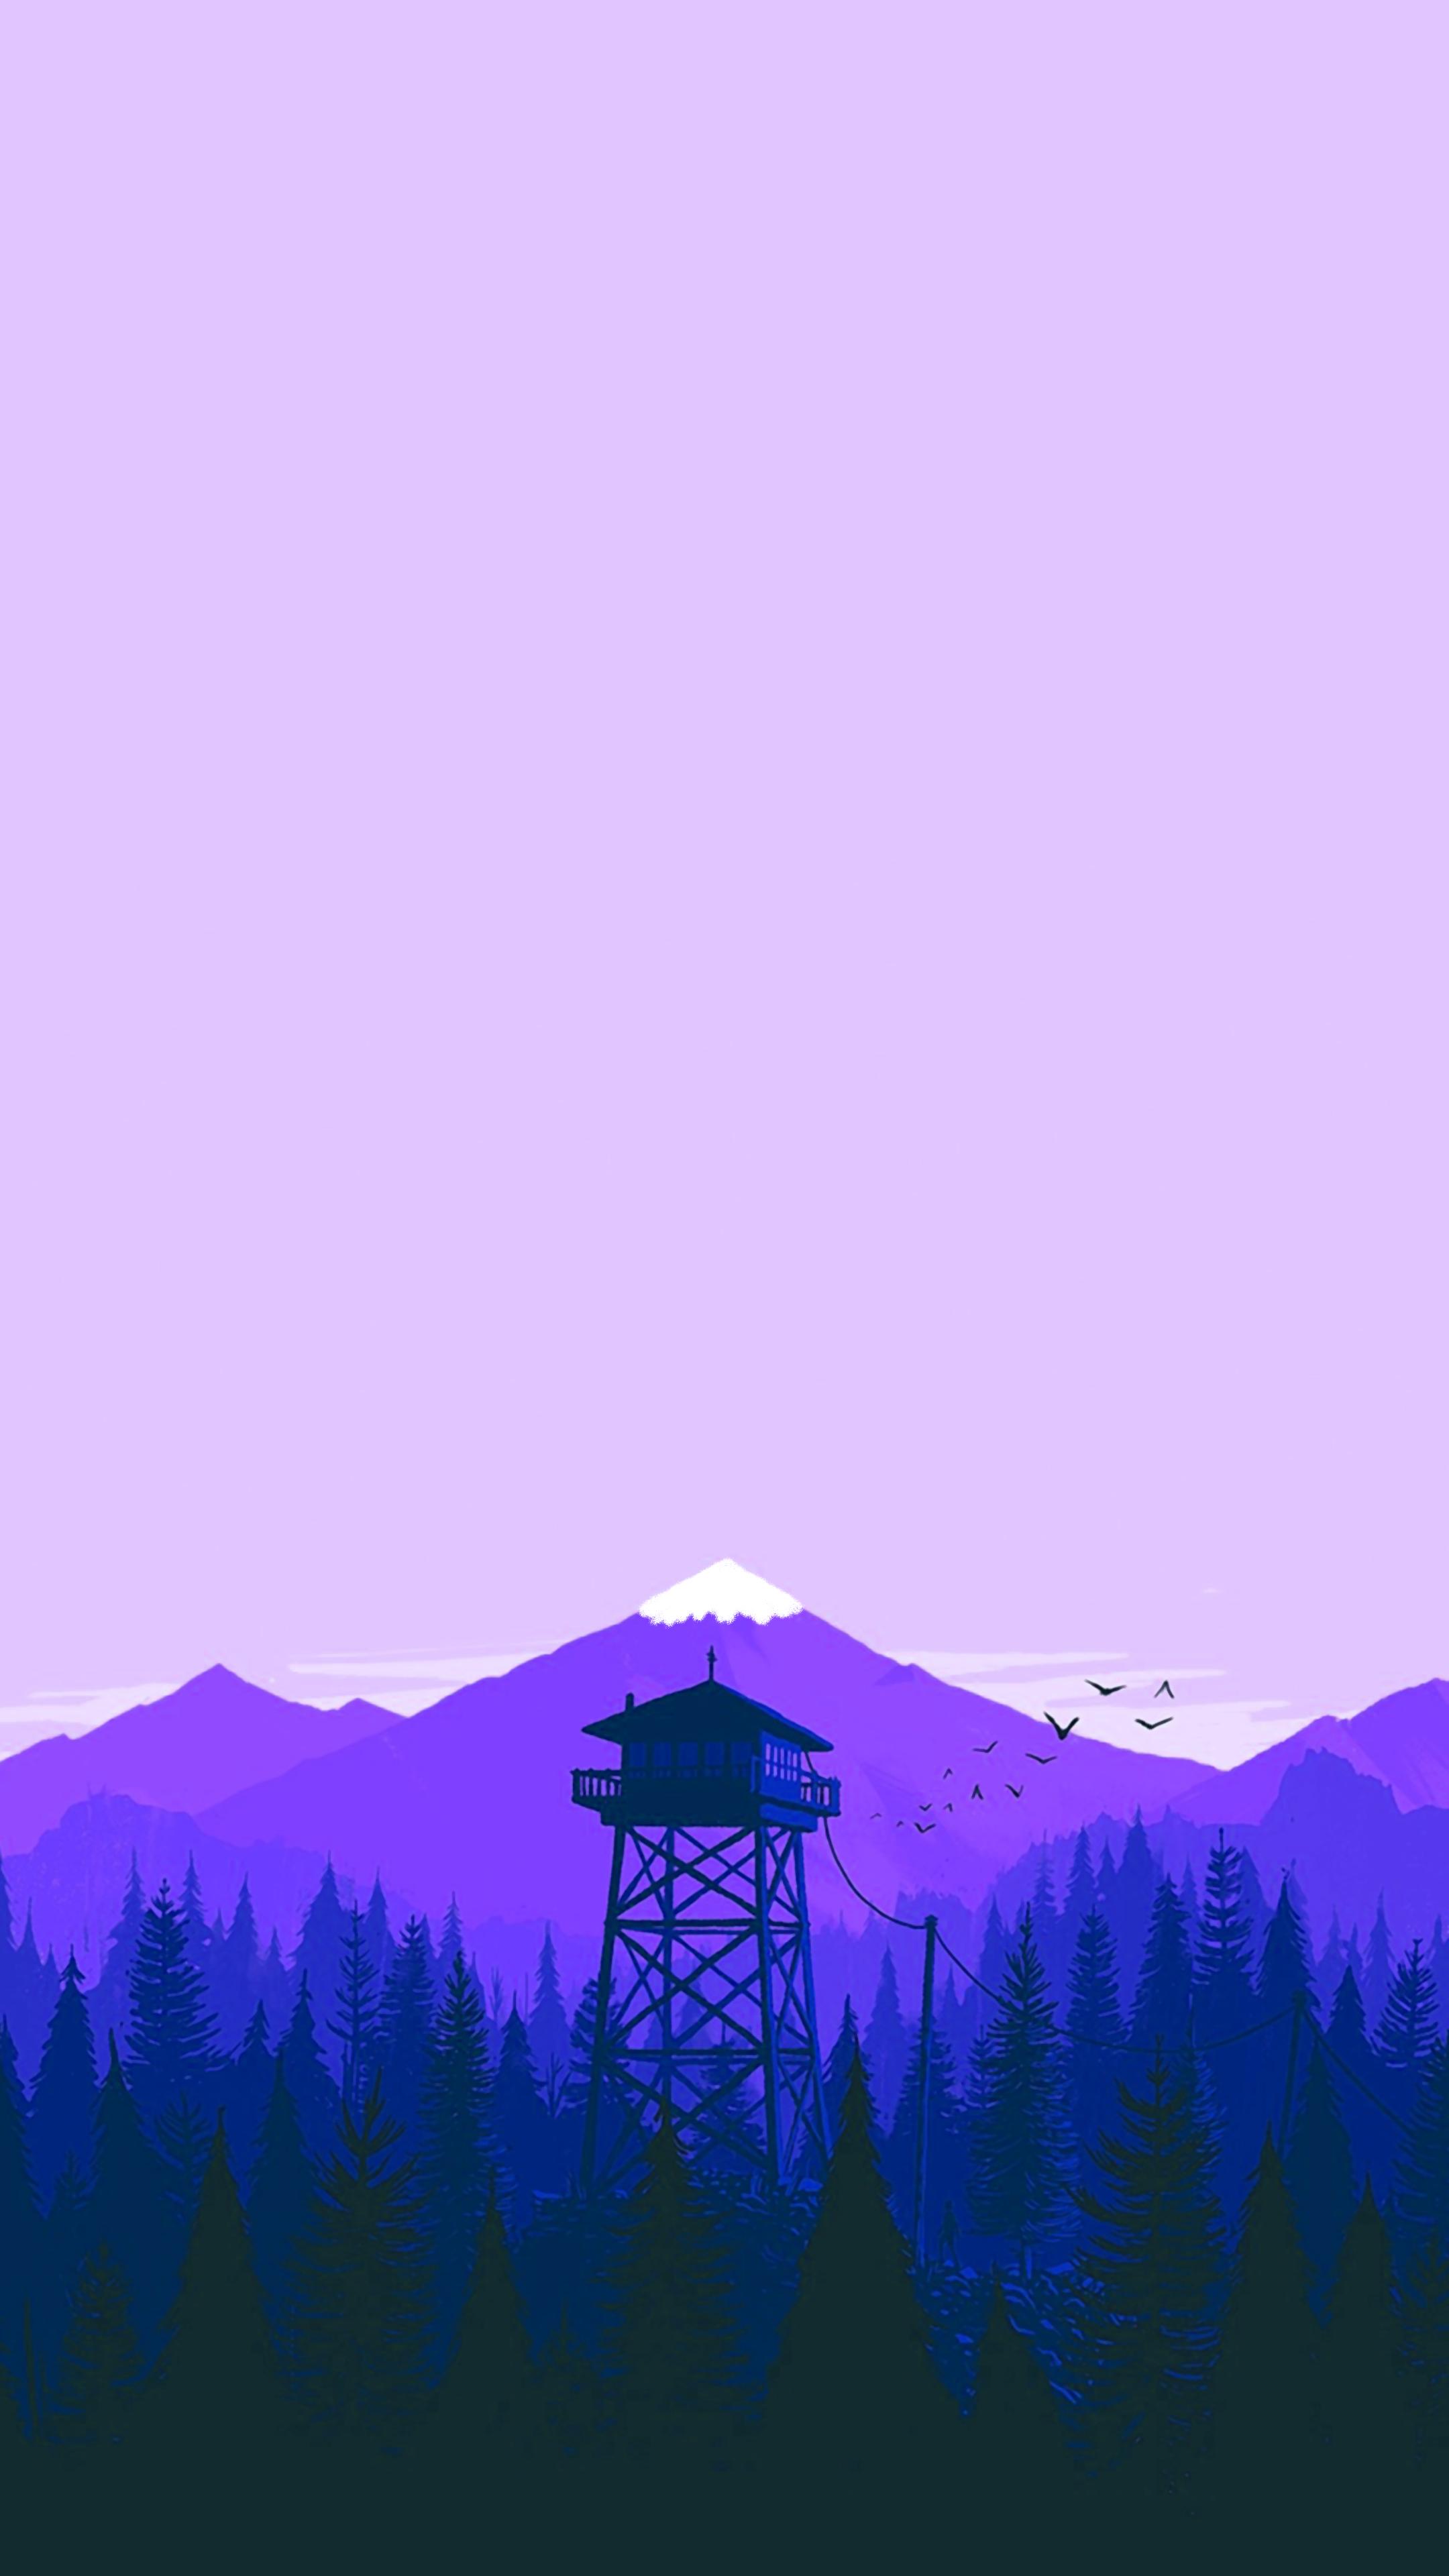 Firewatch Winter Wallpaper in 2020 Winter wallpaper